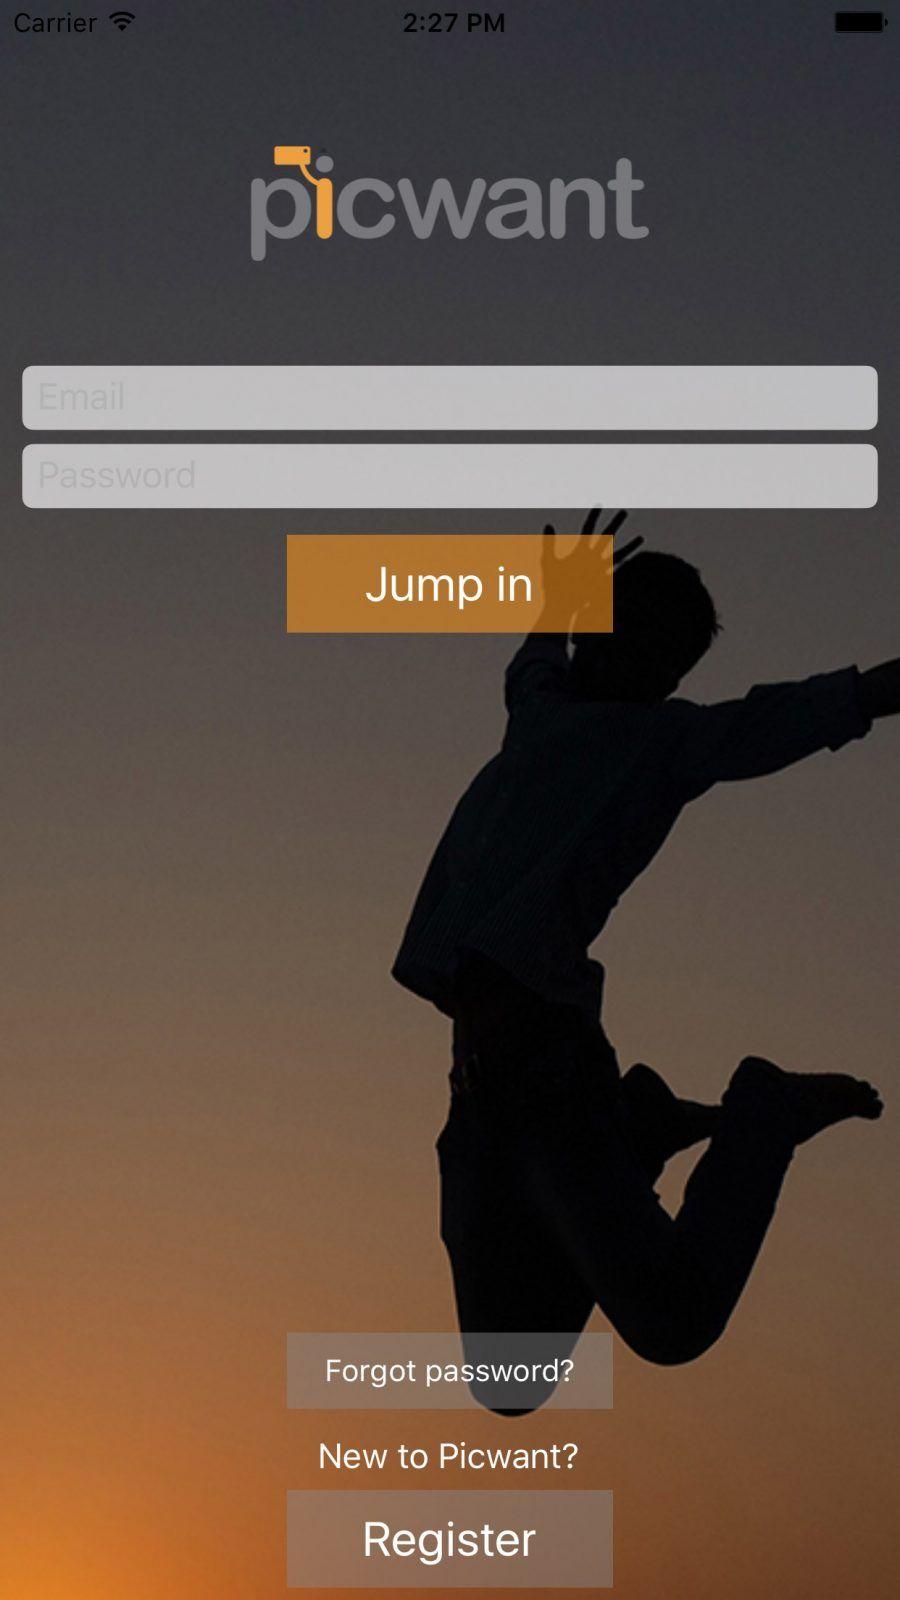 Picwant app register[1]